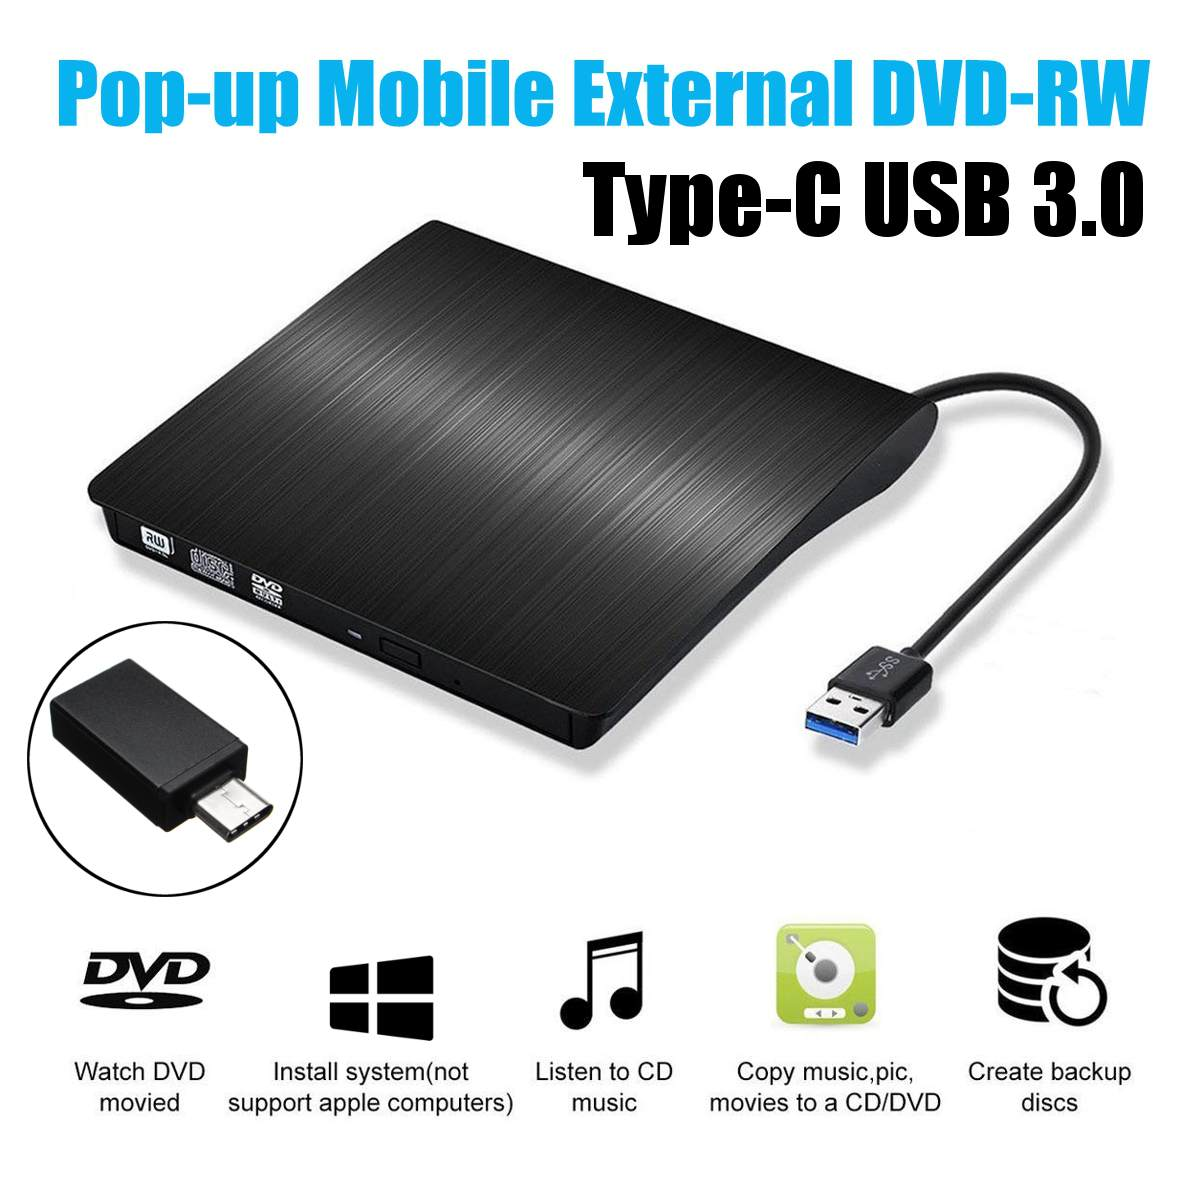 Type C USB 3.0 External DVD/CD/ VCD Burner RW SVCD Drive Player Optical Drive for Mac/PC/Apple Laptop/OS/Windows